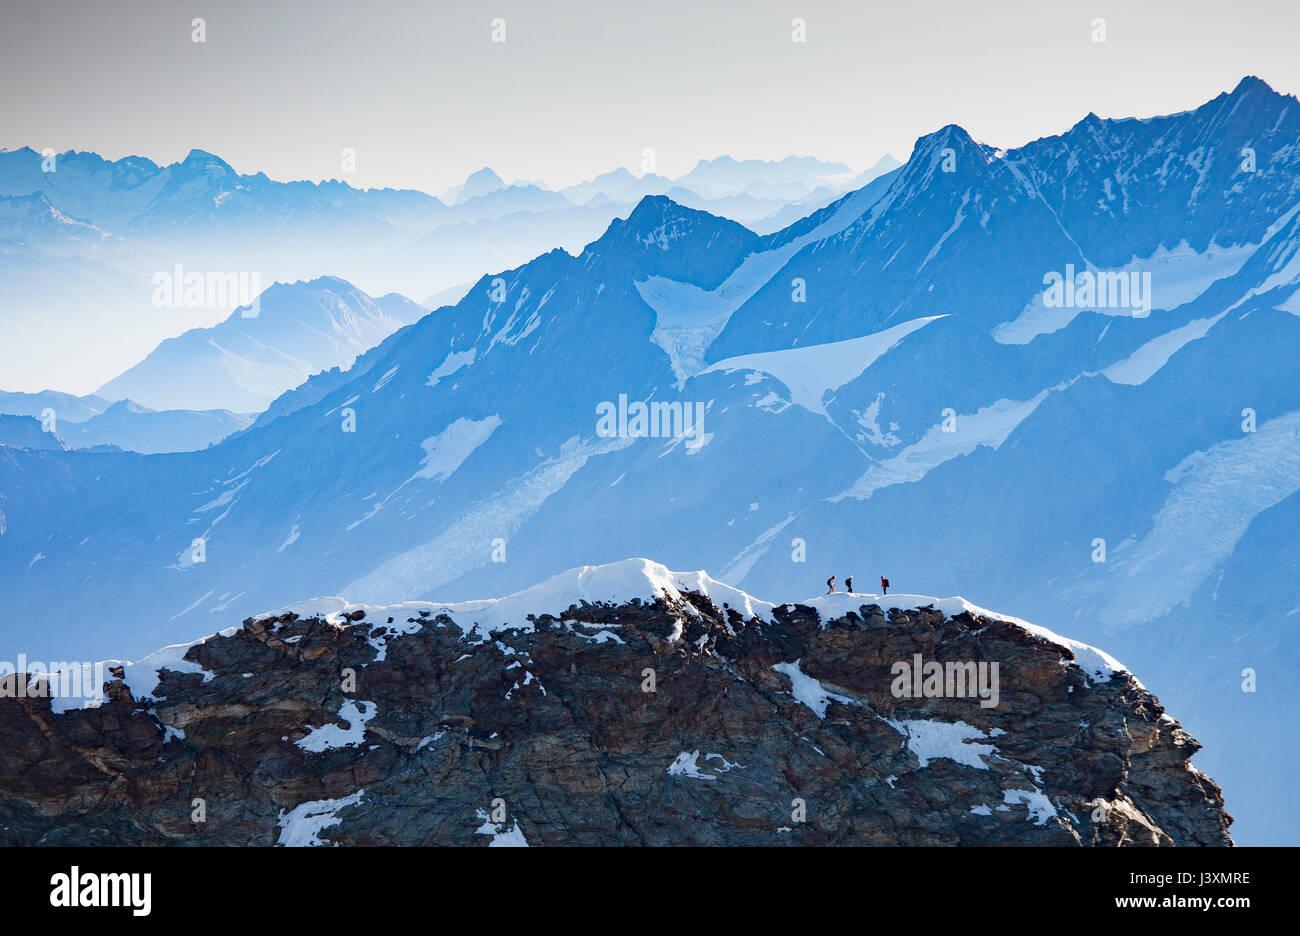 Snow covered mountain peaks, Monte Rosa Piedmont, Italy - Stock Image